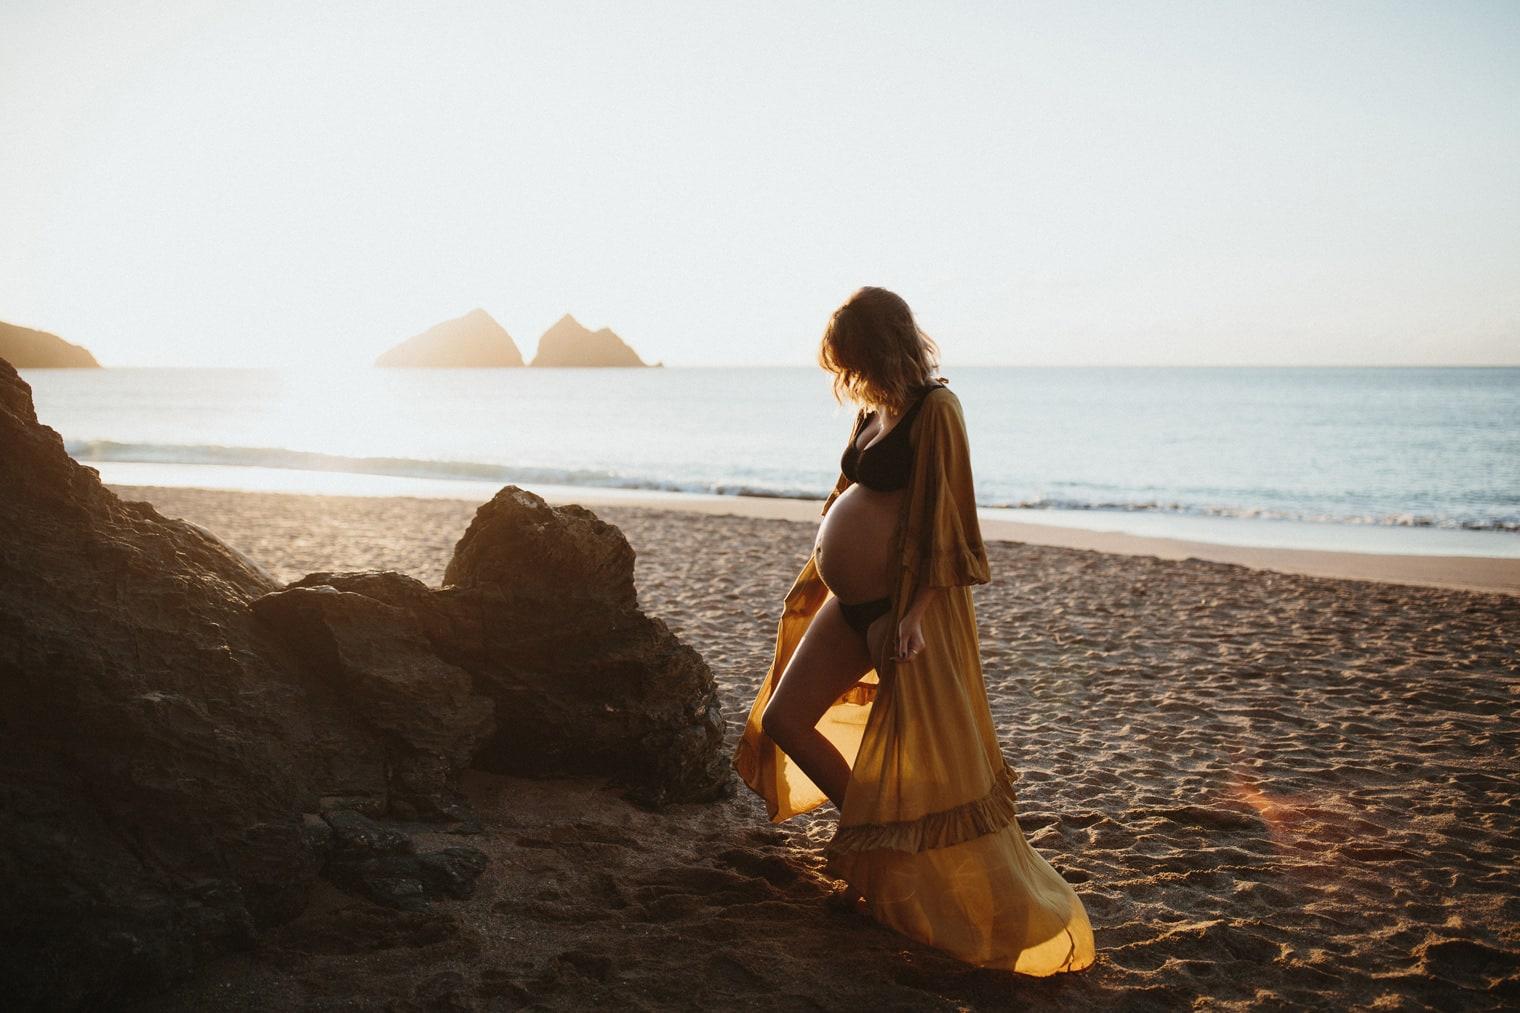 Boho style maternity shoot at Holywell Bay Beach in Cornwall, UK